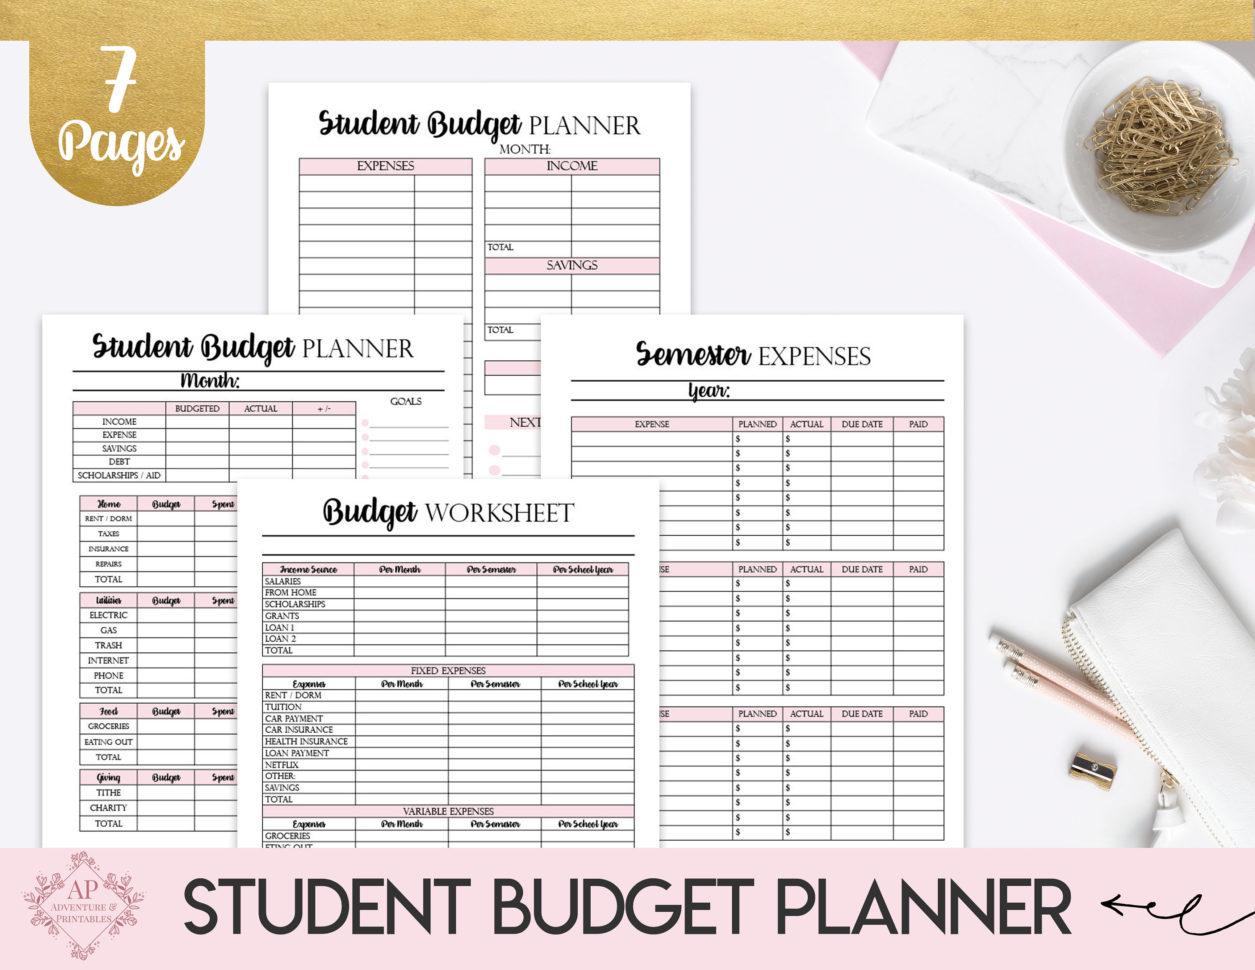 Student Budget Planner Collage Student Budget Worksheet